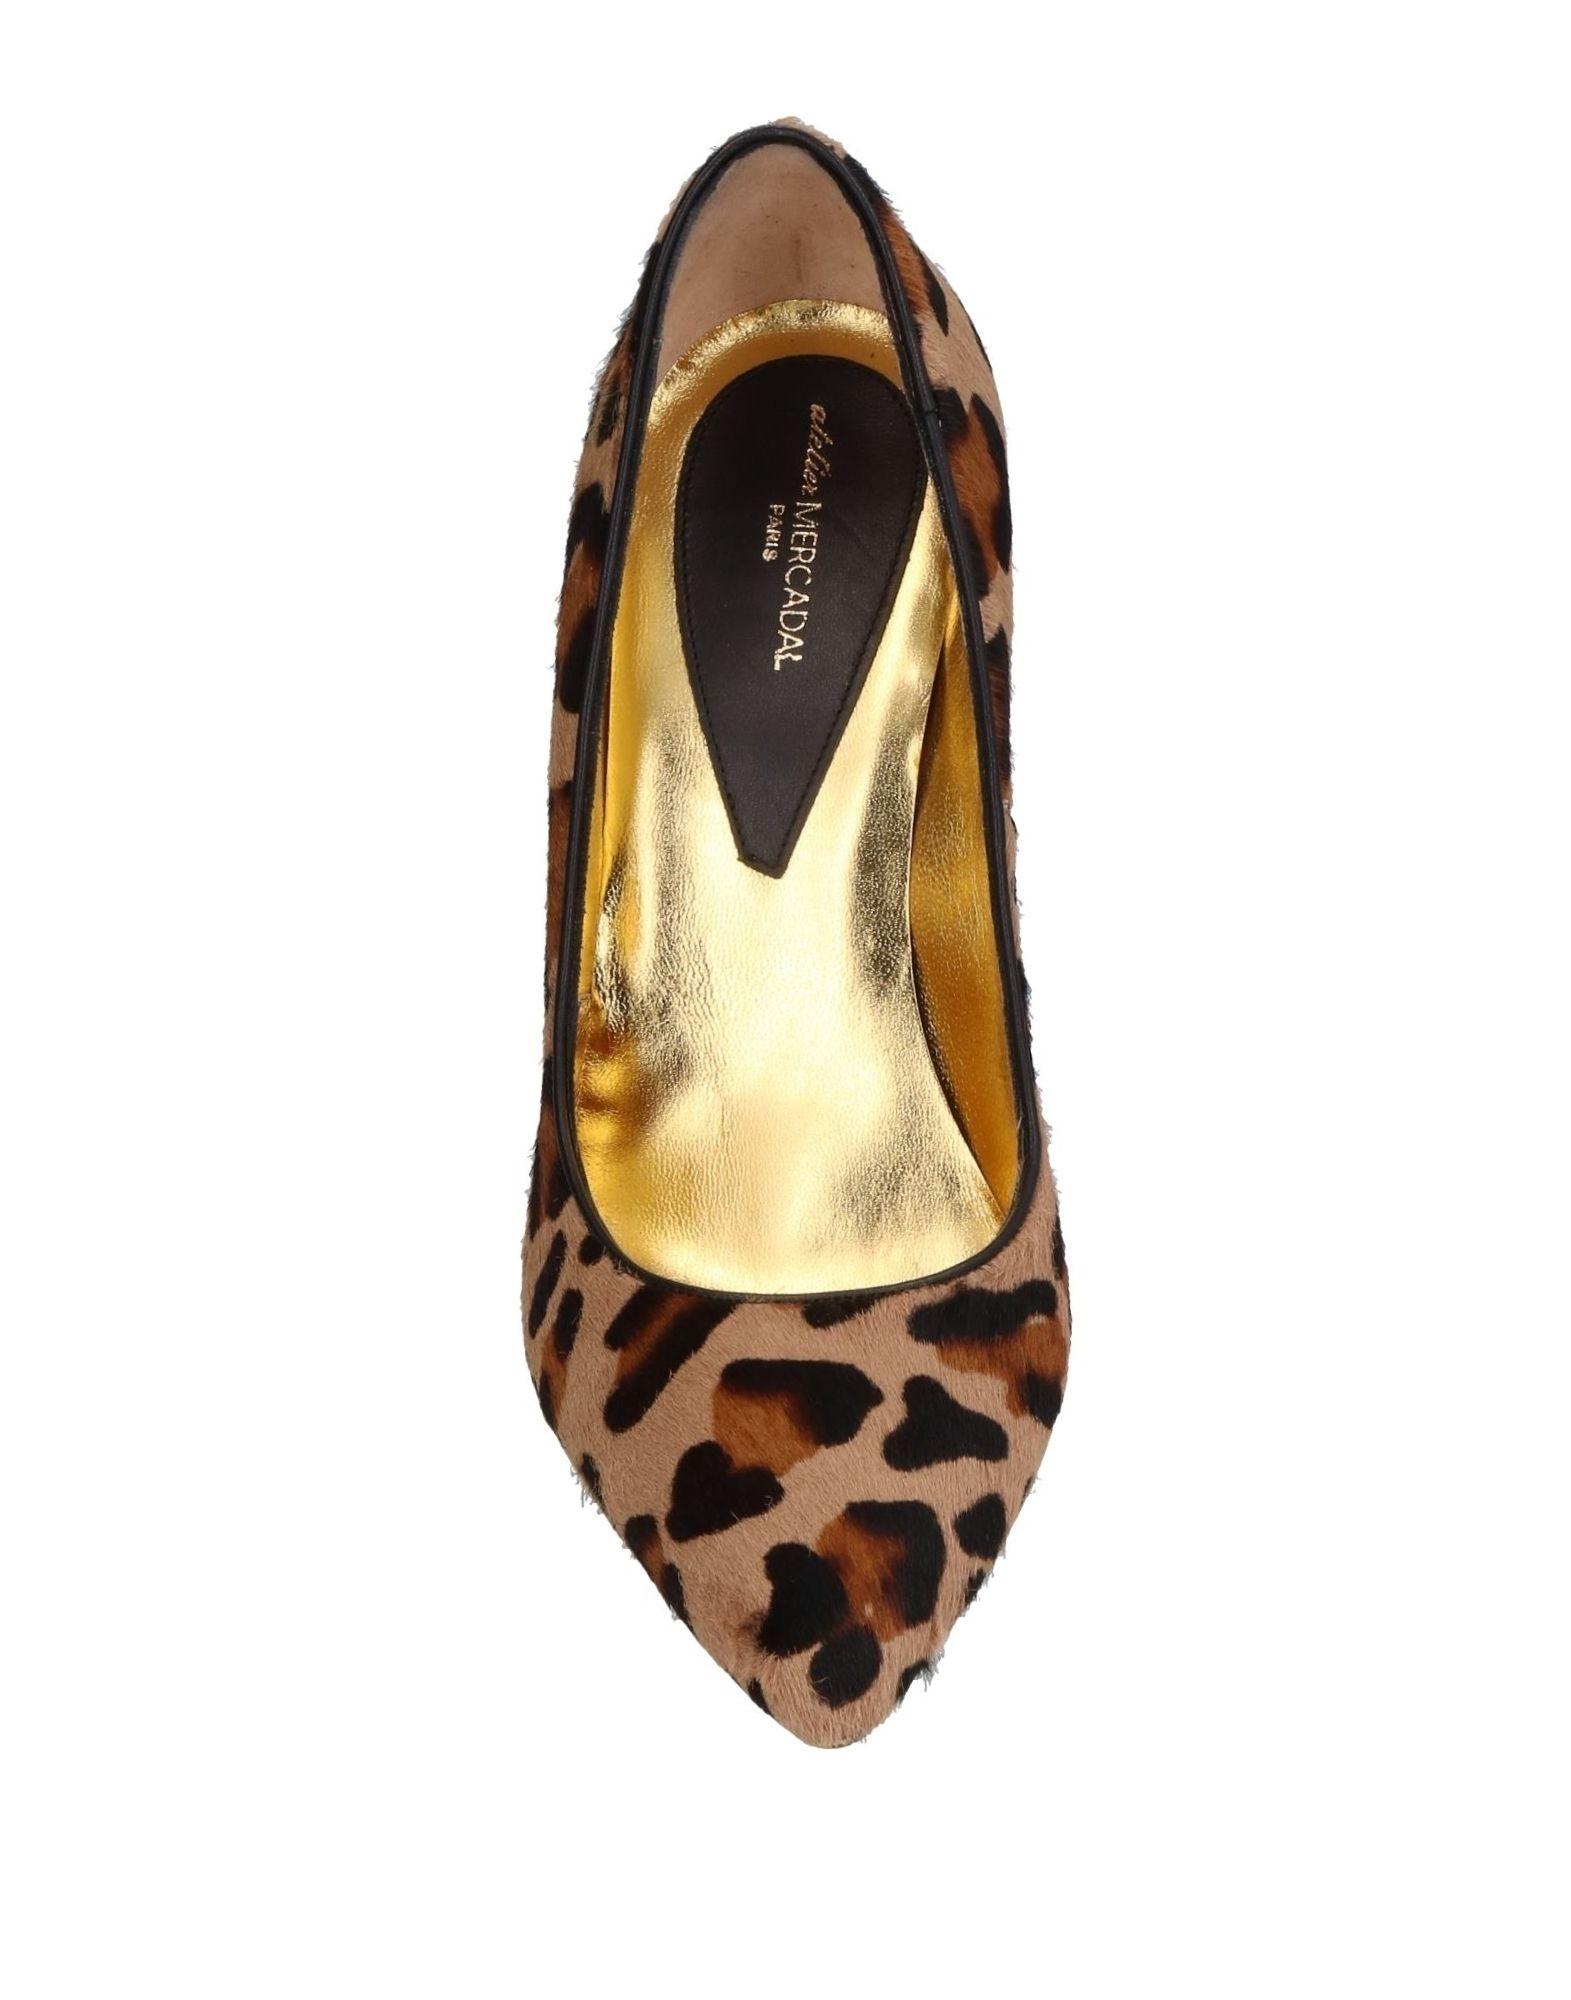 Stilvolle billige Schuhe Atelier Atelier Atelier Mercadal Pumps Damen  11405304TP 1979f1